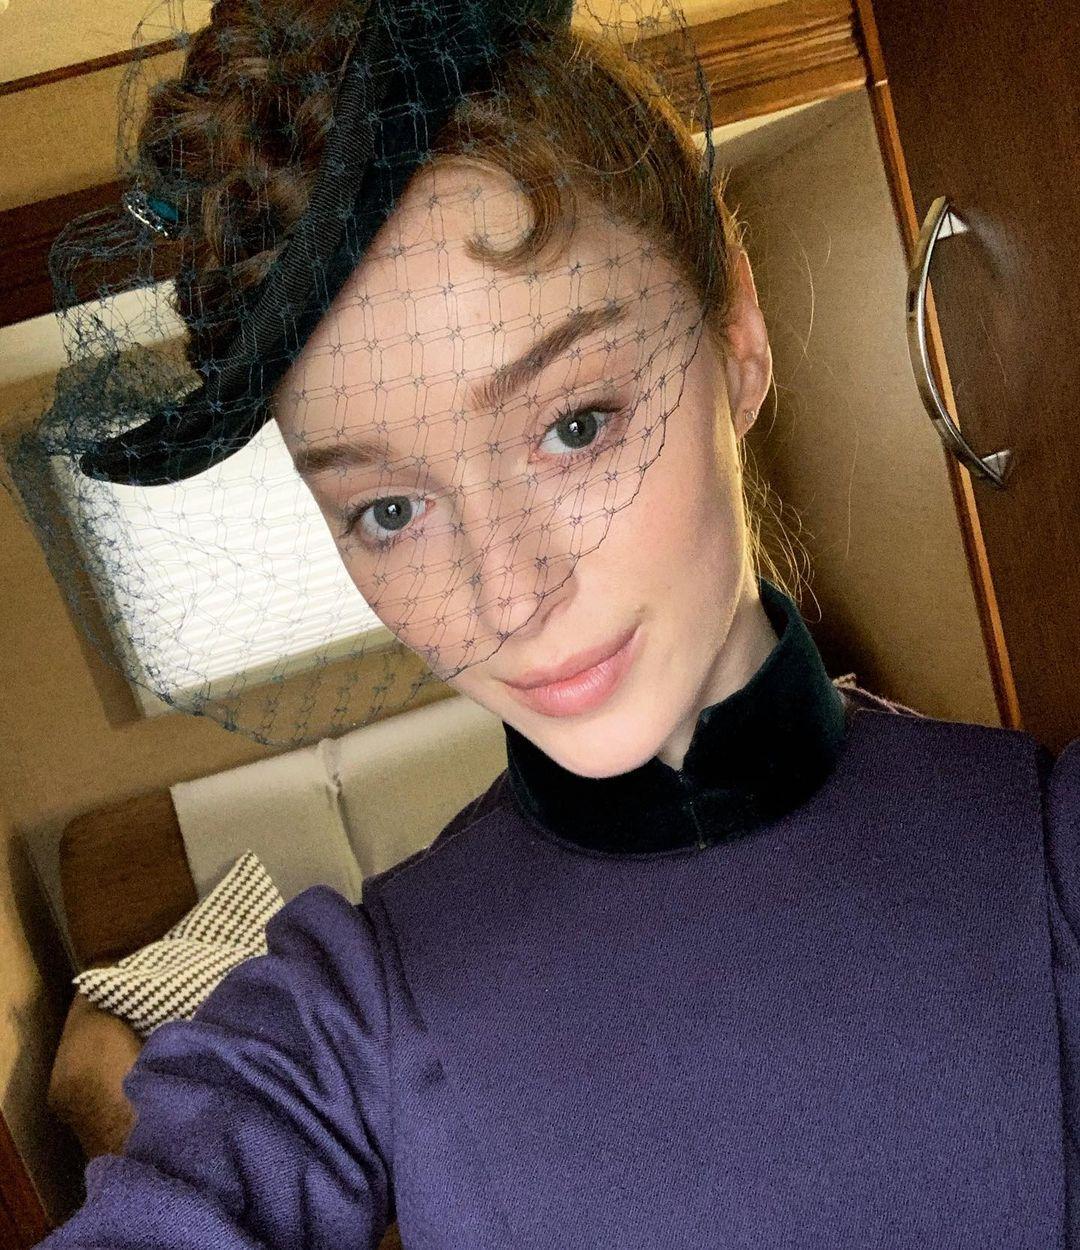 Phoebe Dynevor